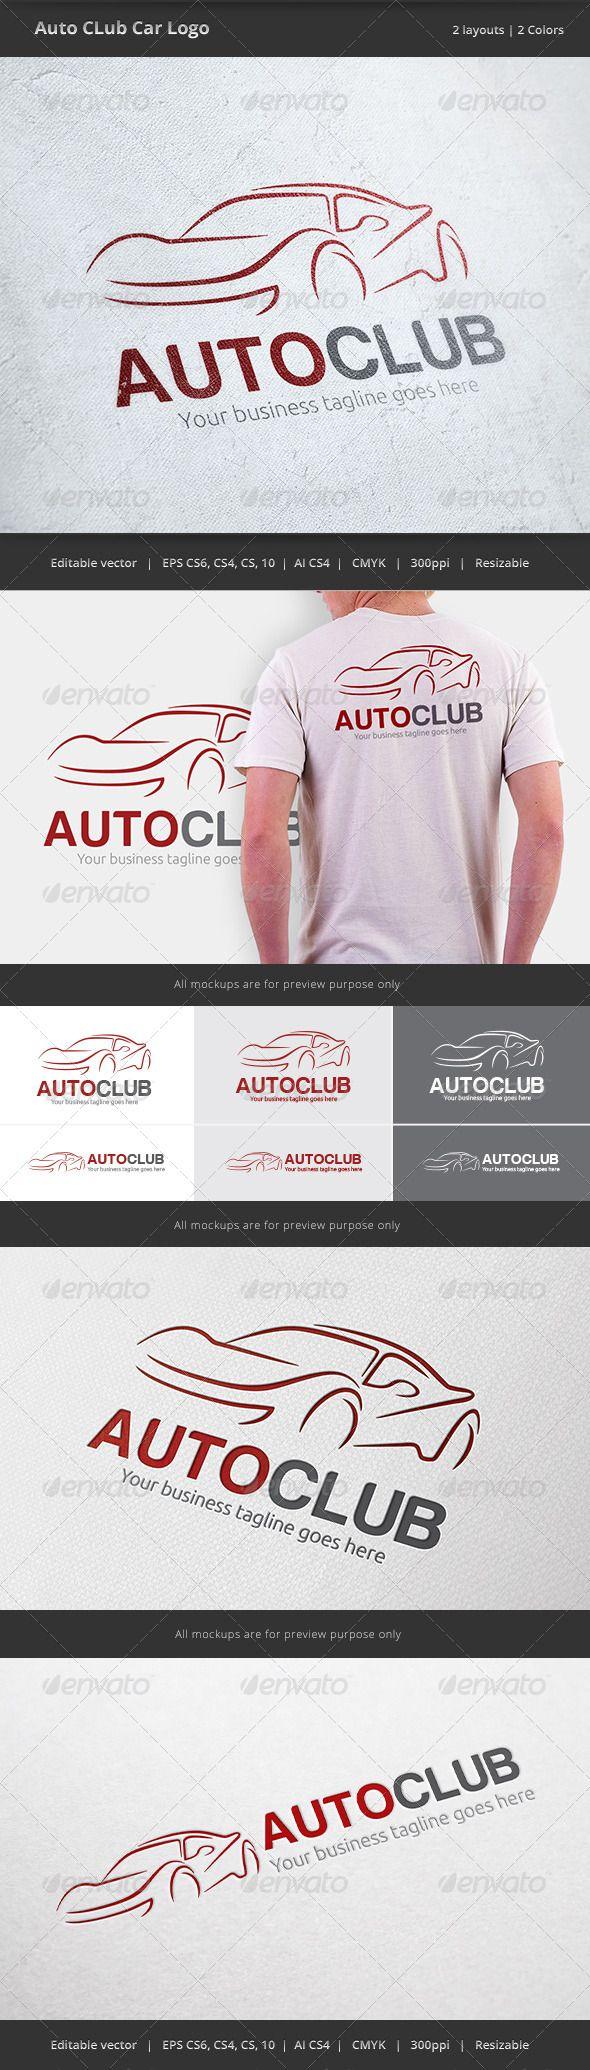 Auto Club Car  - Logo Design Template Vector #logotype Download it here: http://graphicriver.net/item/auto-club-car-logo/6568679?s_rank=324?ref=nexion